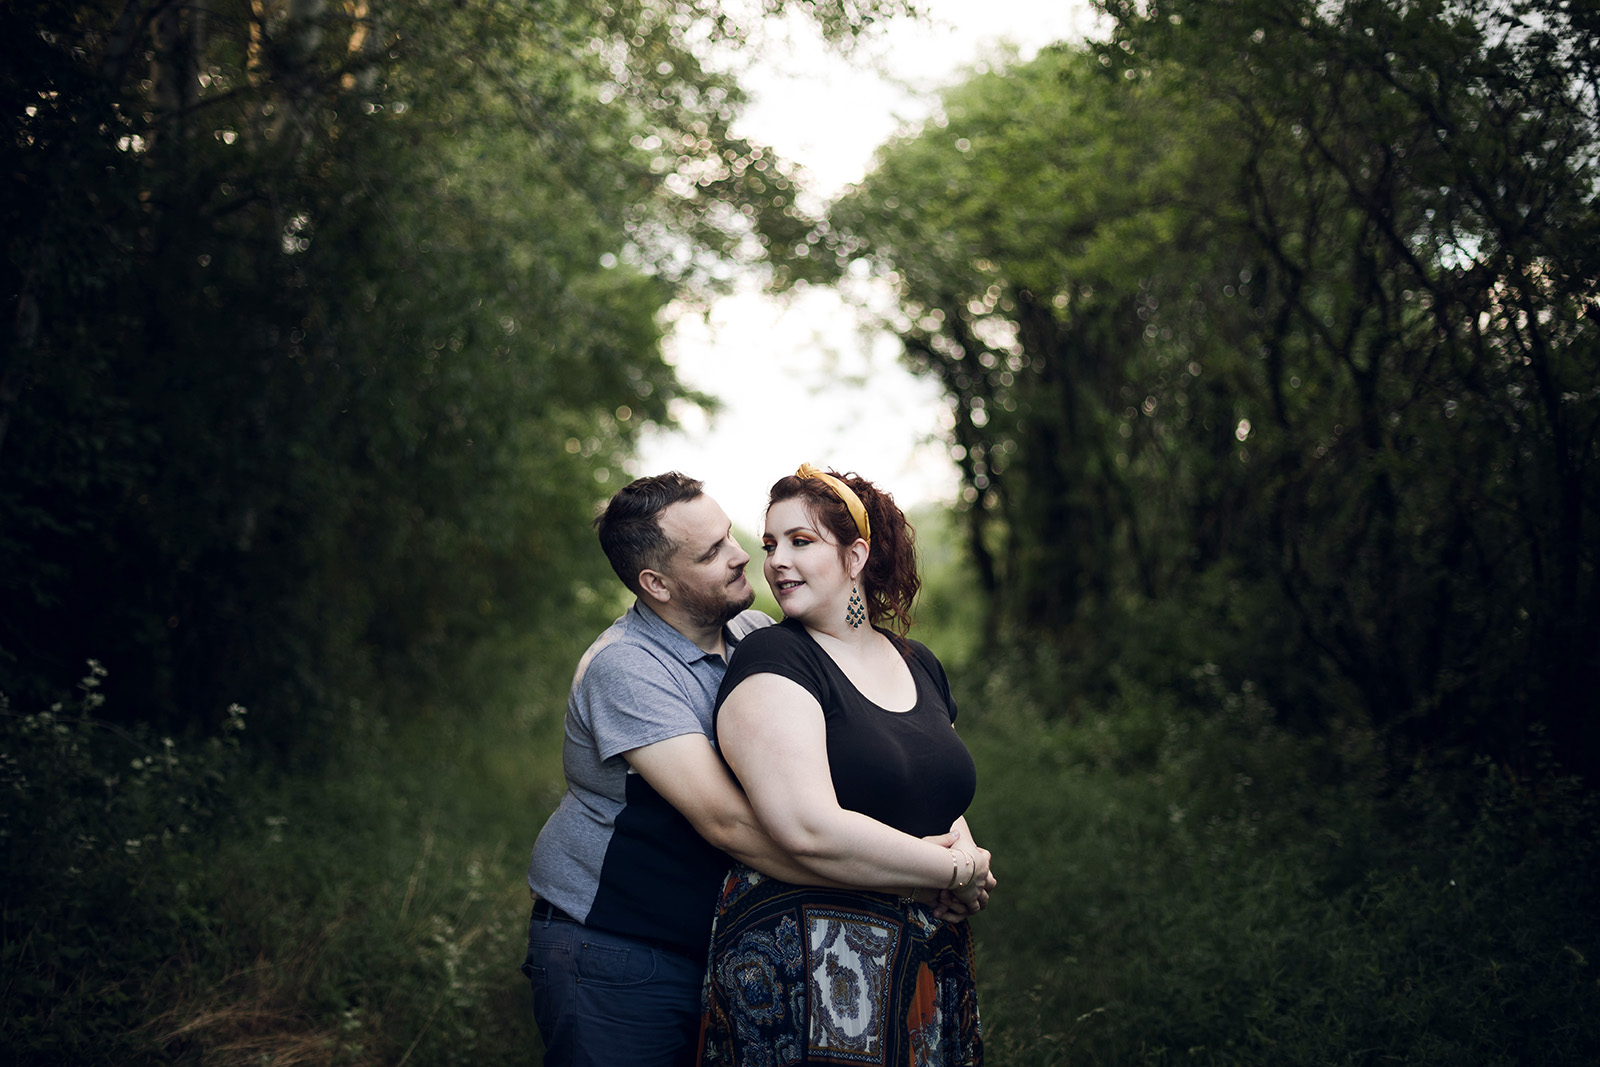 seance-photo-engagement-love-session-mariage-wedding-photographe-photographer-lyon-auvergne-rhone-alpes-couple-save-the-date-shooting-photoshoot-reportage-8